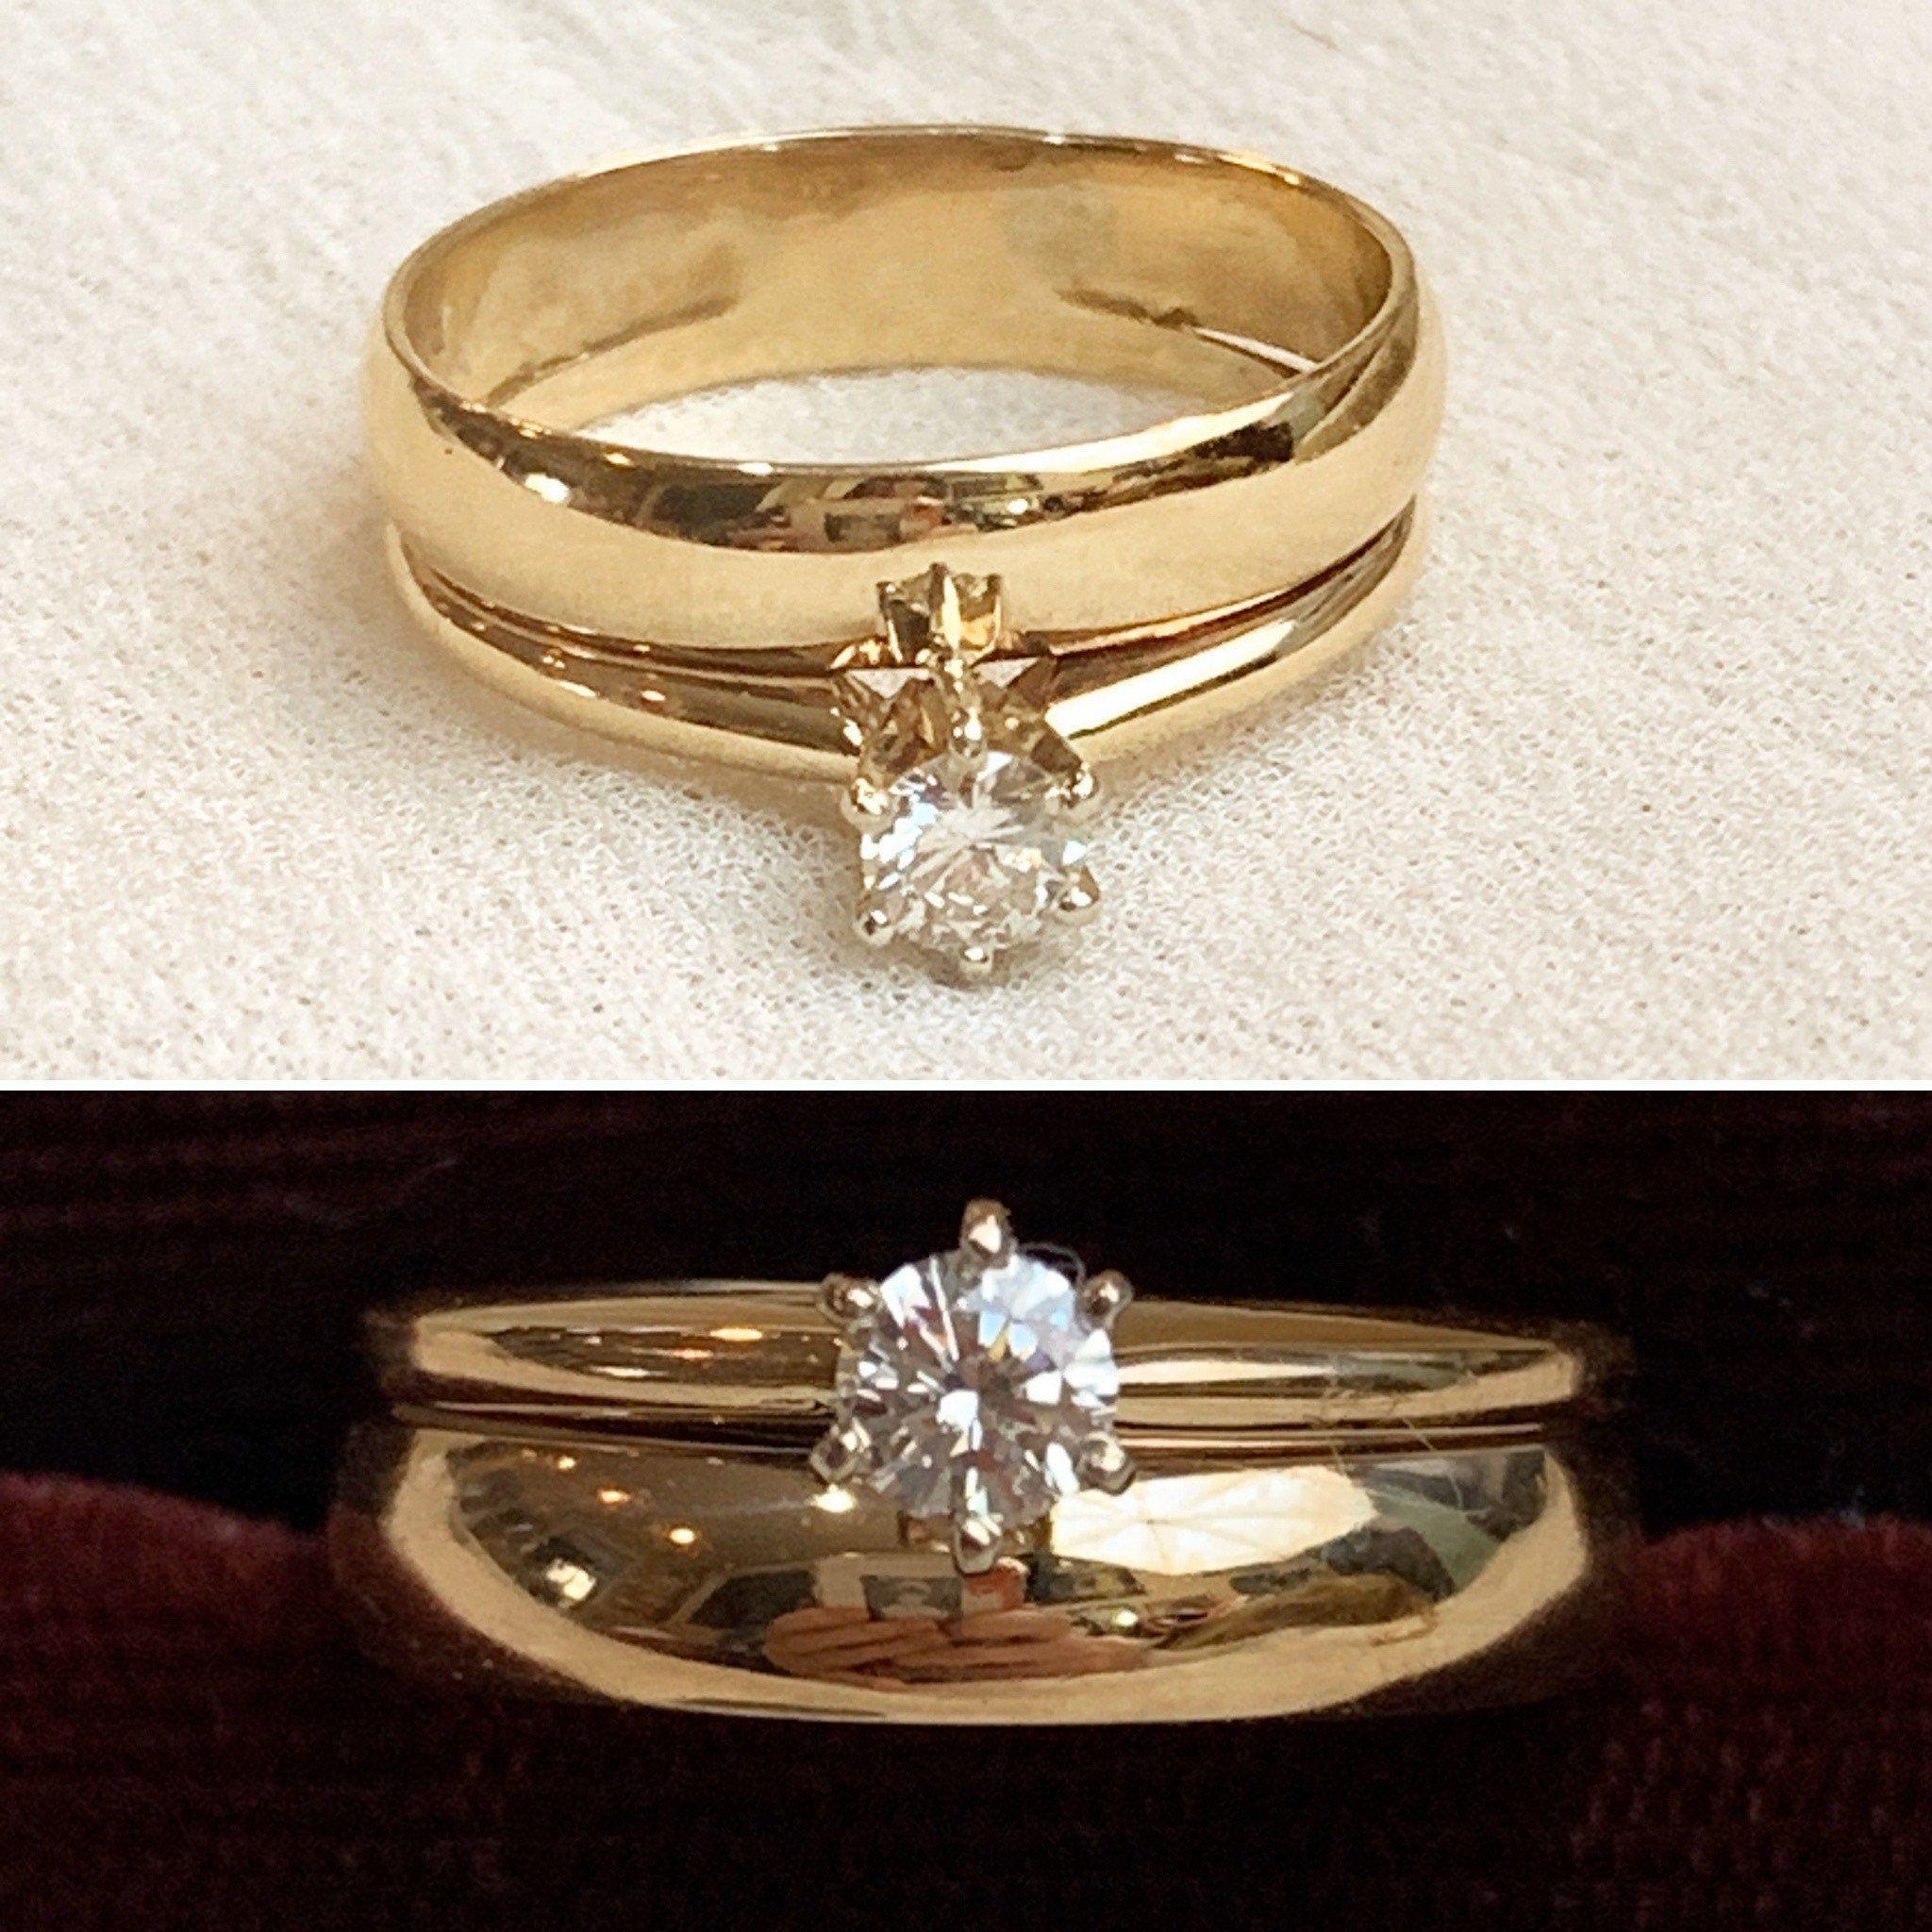 10k Plumb Gold Round Diamond Solitaire Bridal Set Vintage 10k Etsy White Gold Diamond Engagement Gold Jewelry For Sale White Gold Diamonds